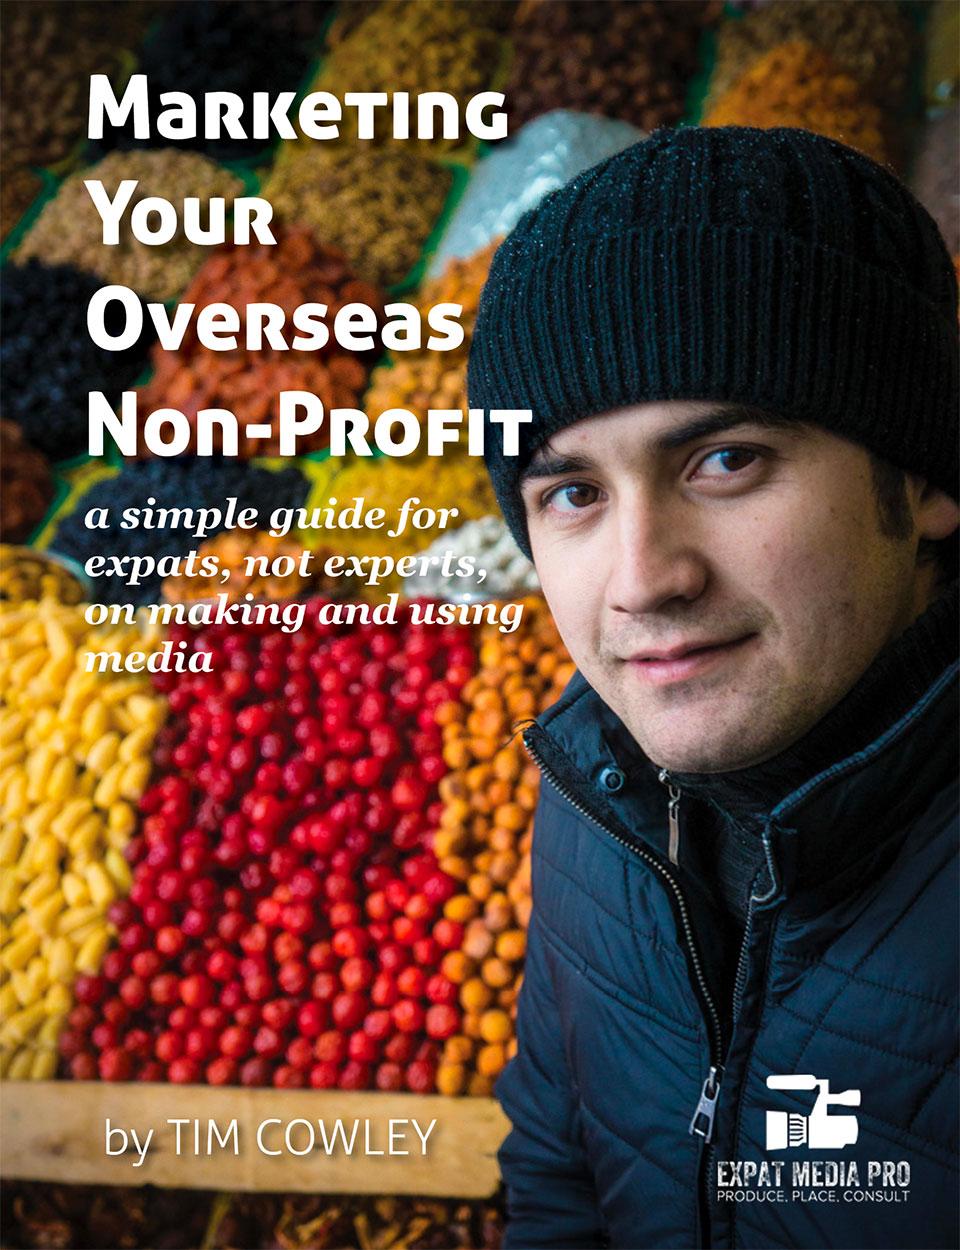 Marketing-Your-Overseas-Non-Profit-image.jpg